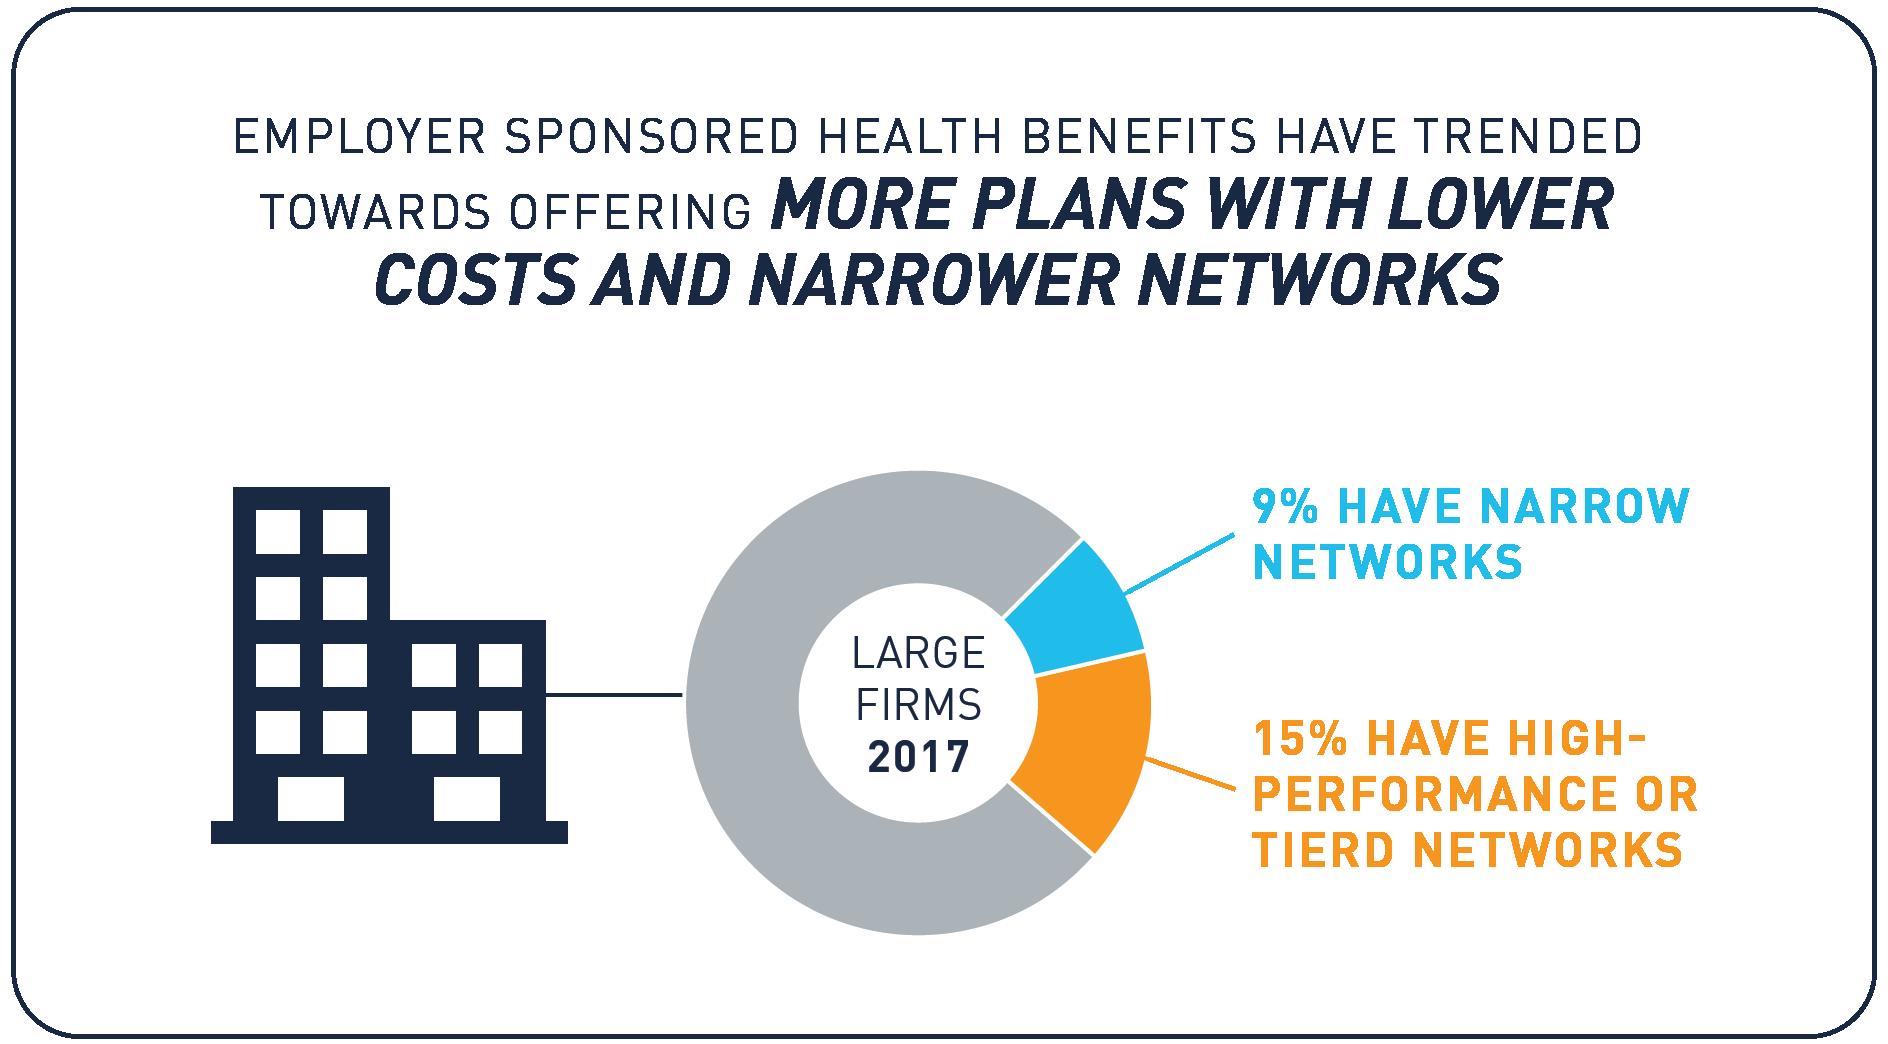 https://www.kff.org/report-section/ehbs-2017-summary-of-findings/